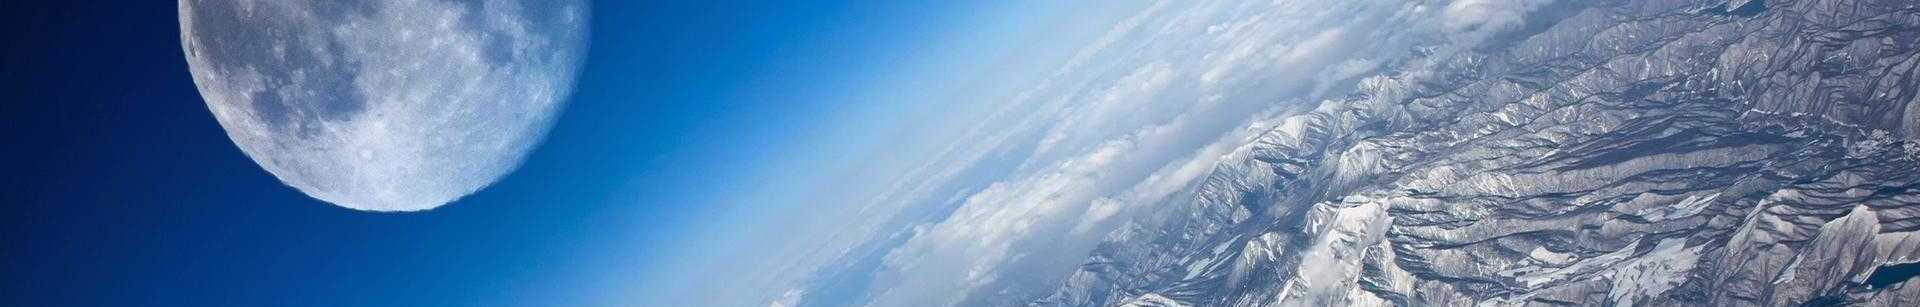 世界的HP banner